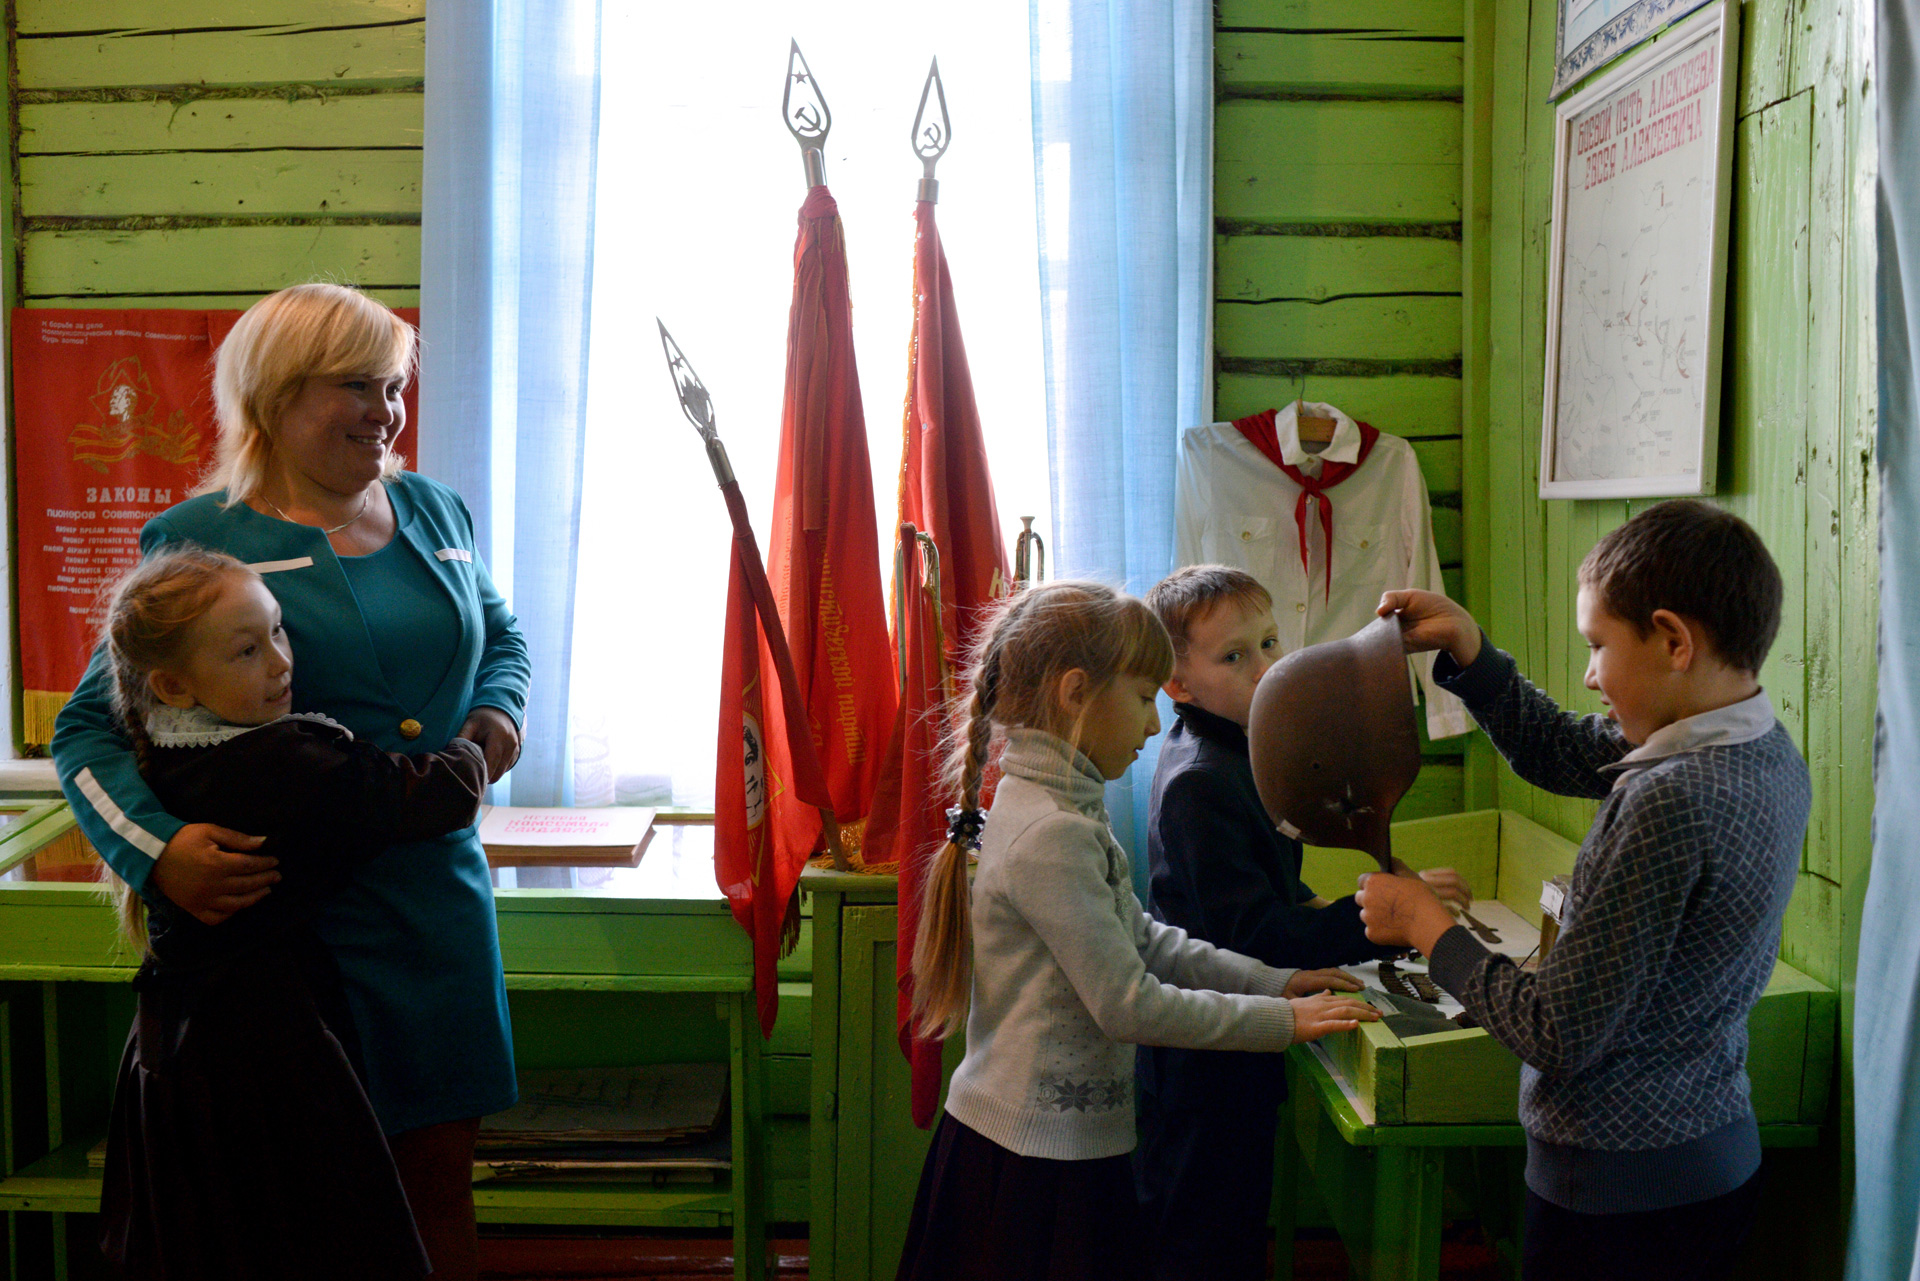 Ponomarev_school-mariy-el_17 Деревня СардаялМари-Турекского районаМарий Эл Марий Эл Посреди России